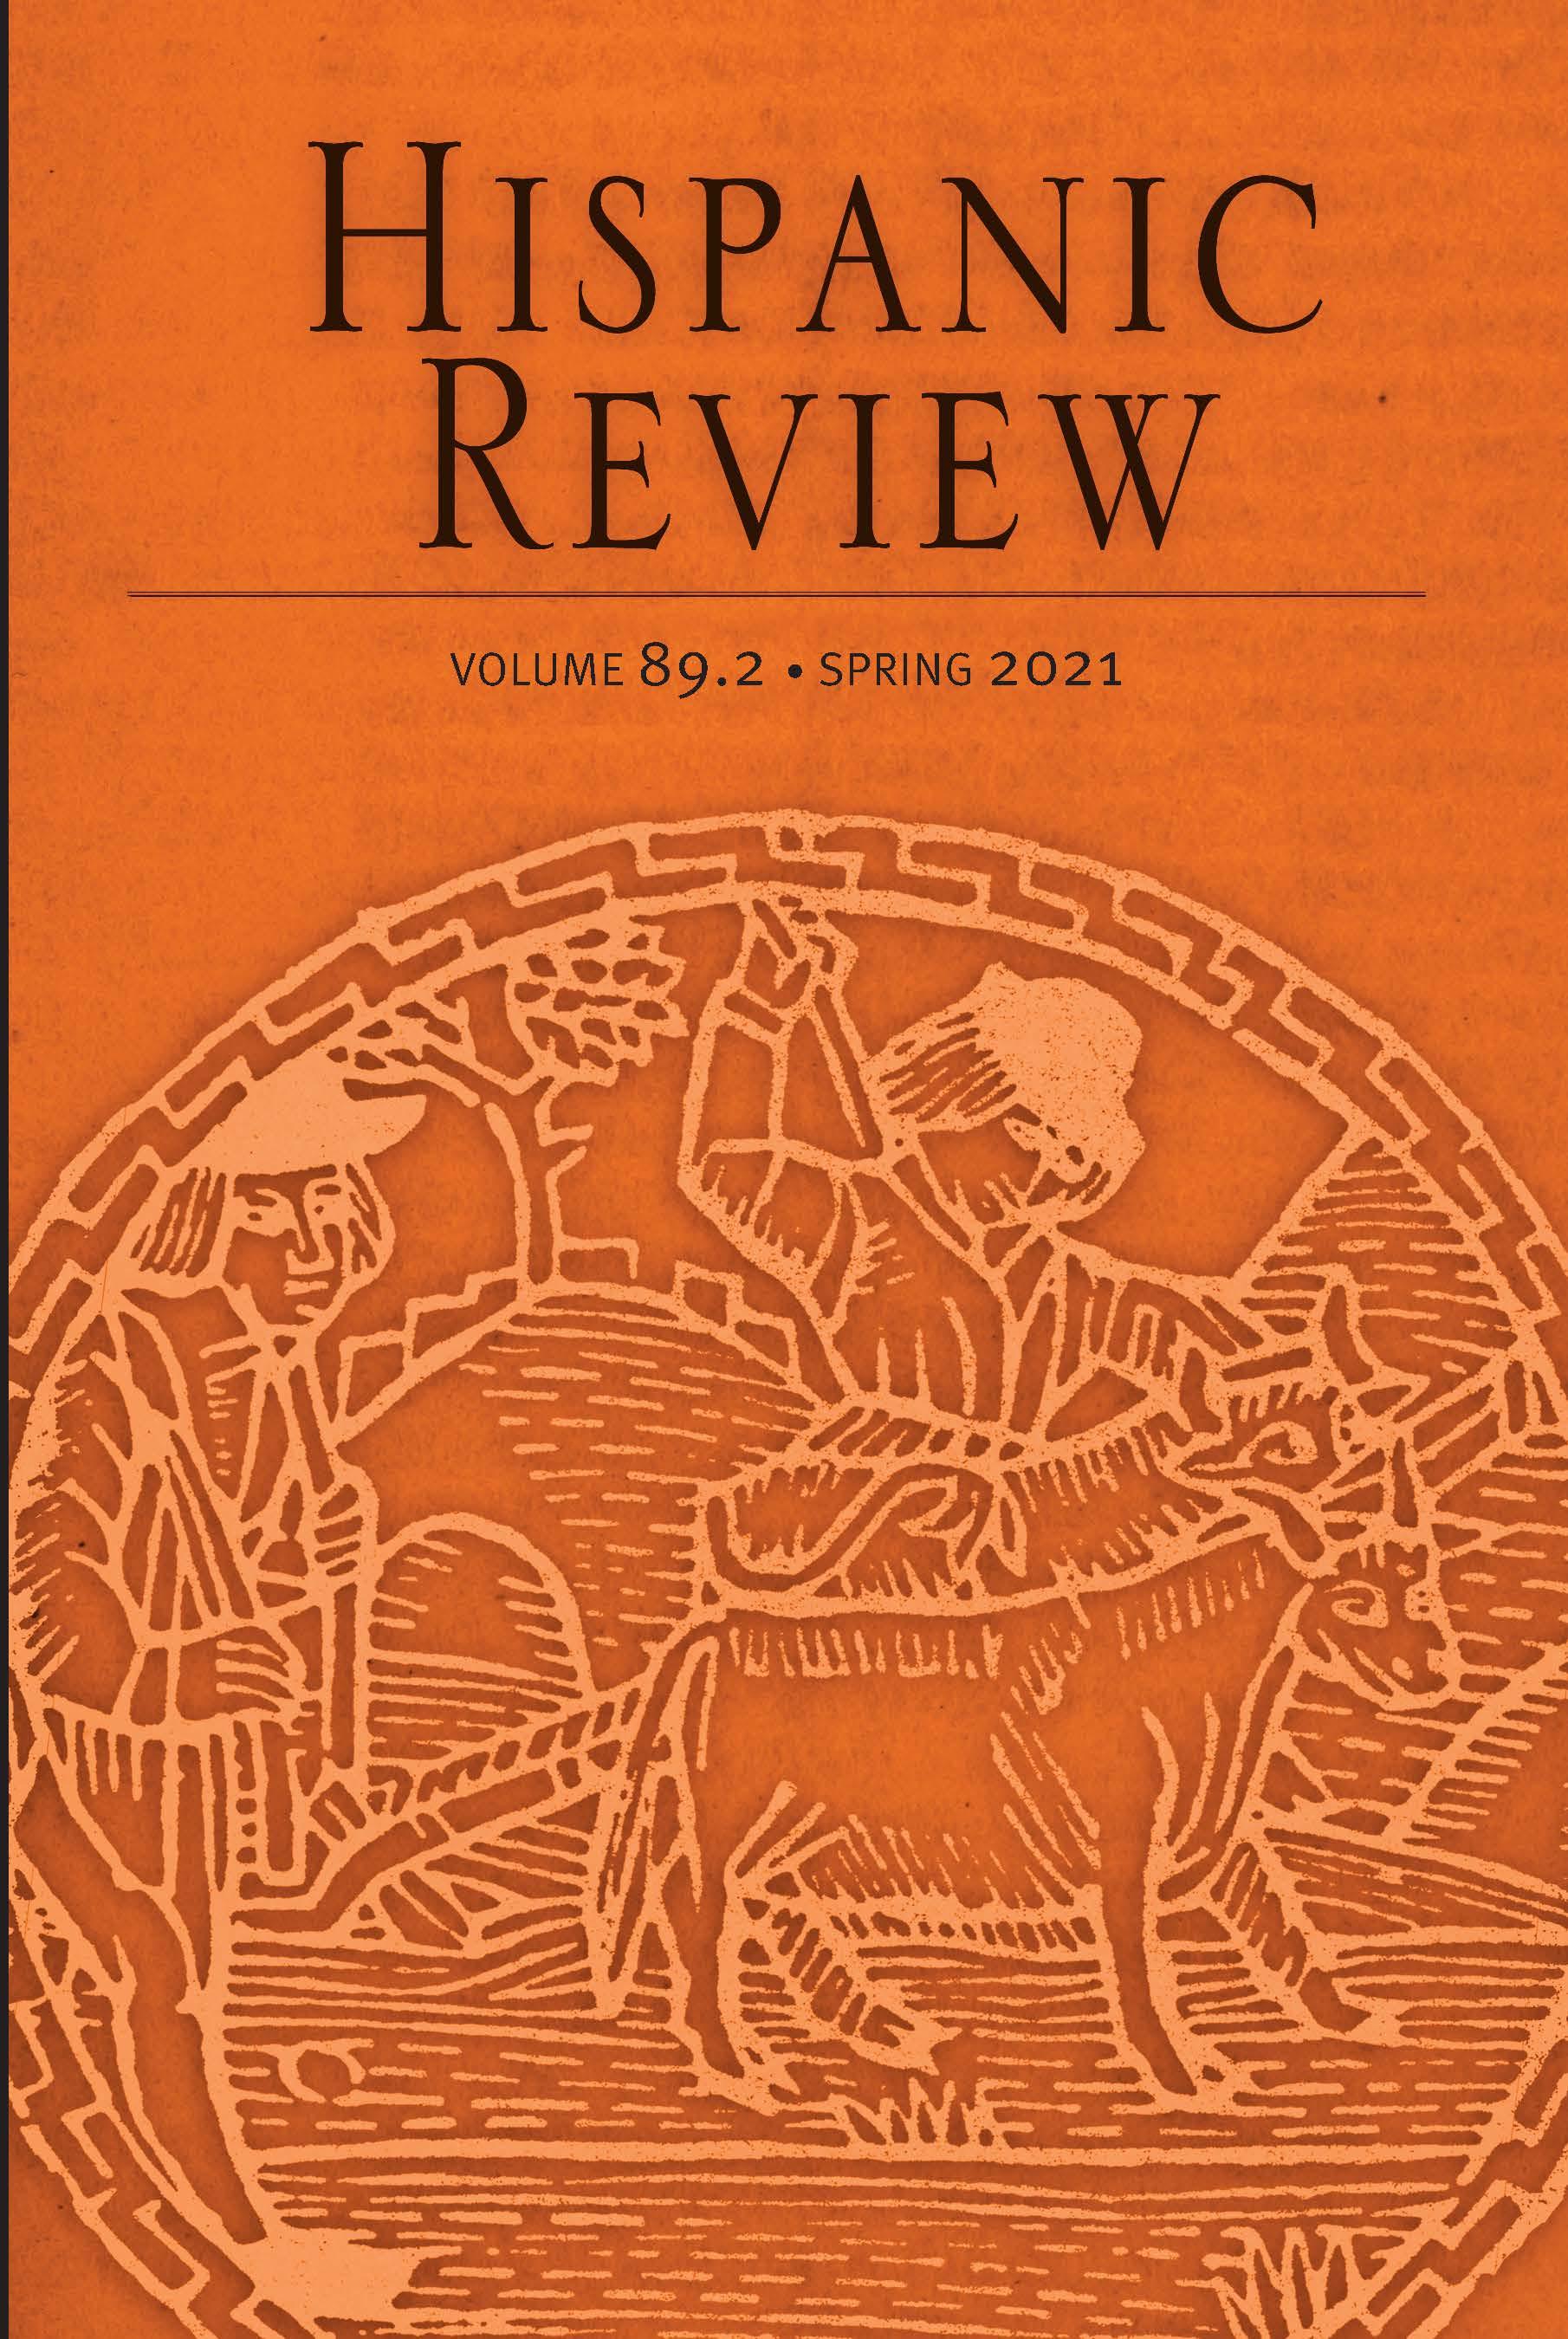 Hispanic Review: Volume 89, Number 2, Spring 2021